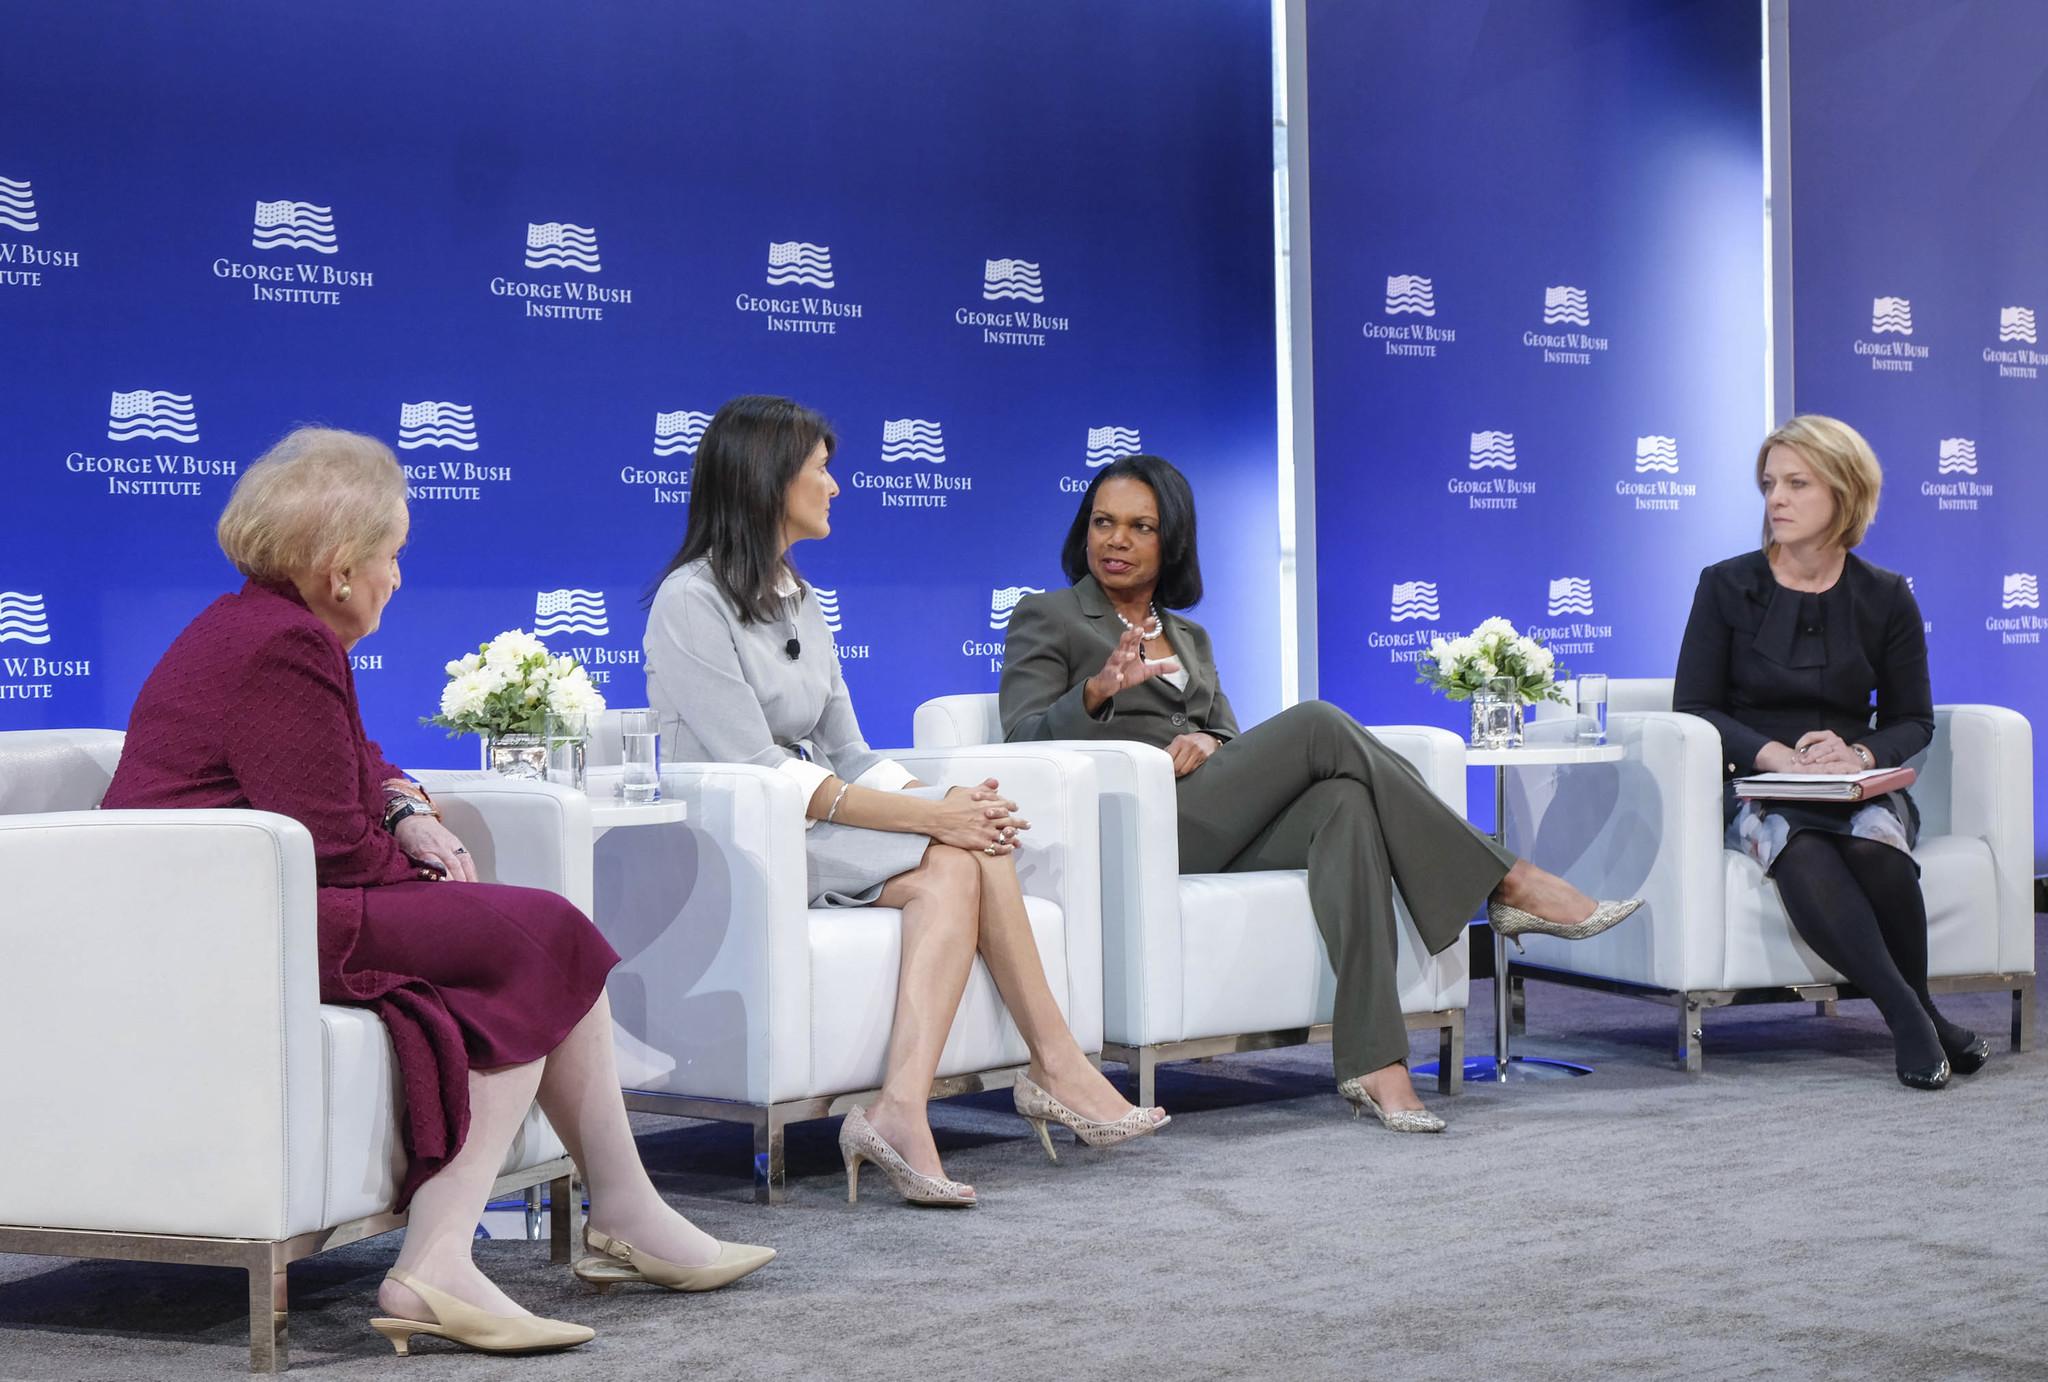 Global Leadership: A Look Back At 2017